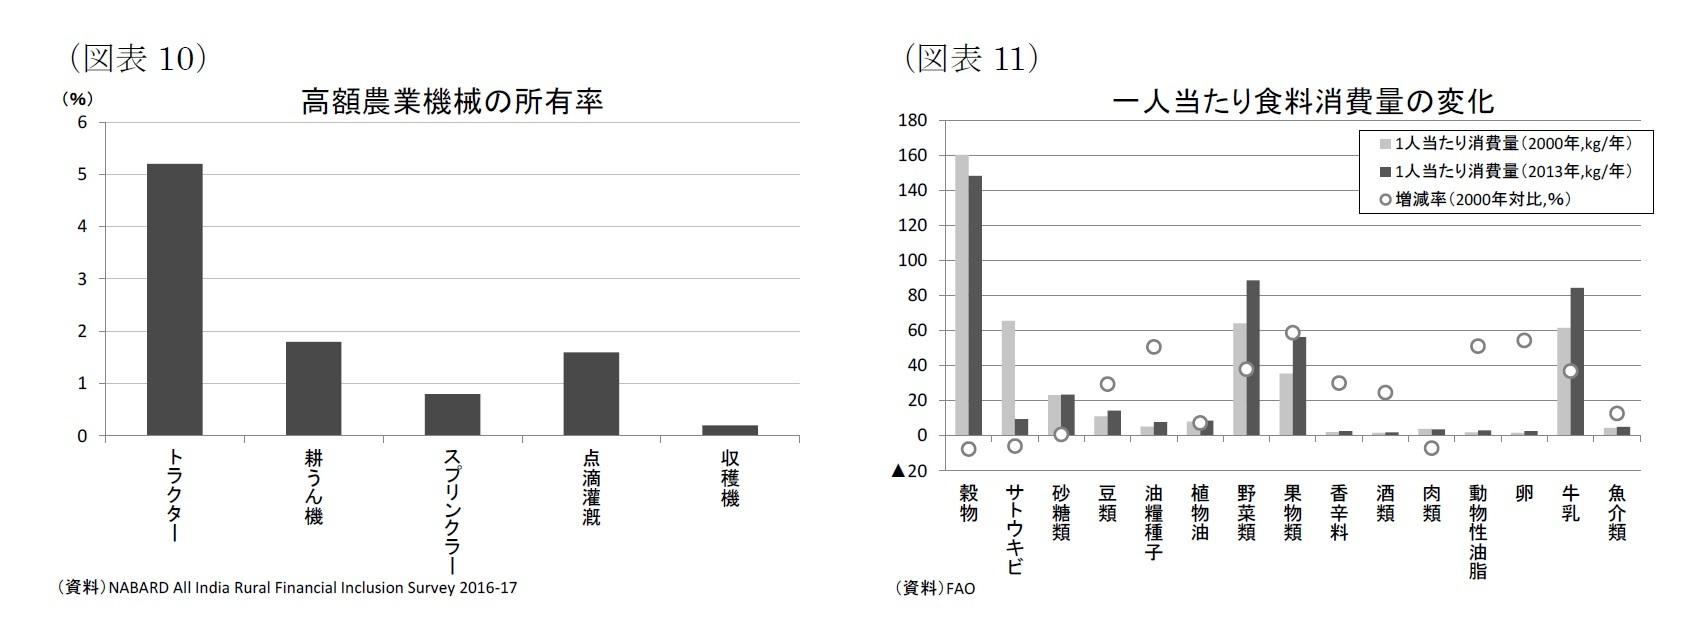 (図表10)高額農業機械の所有率/(図表11)一人当たり食料消費量の変化